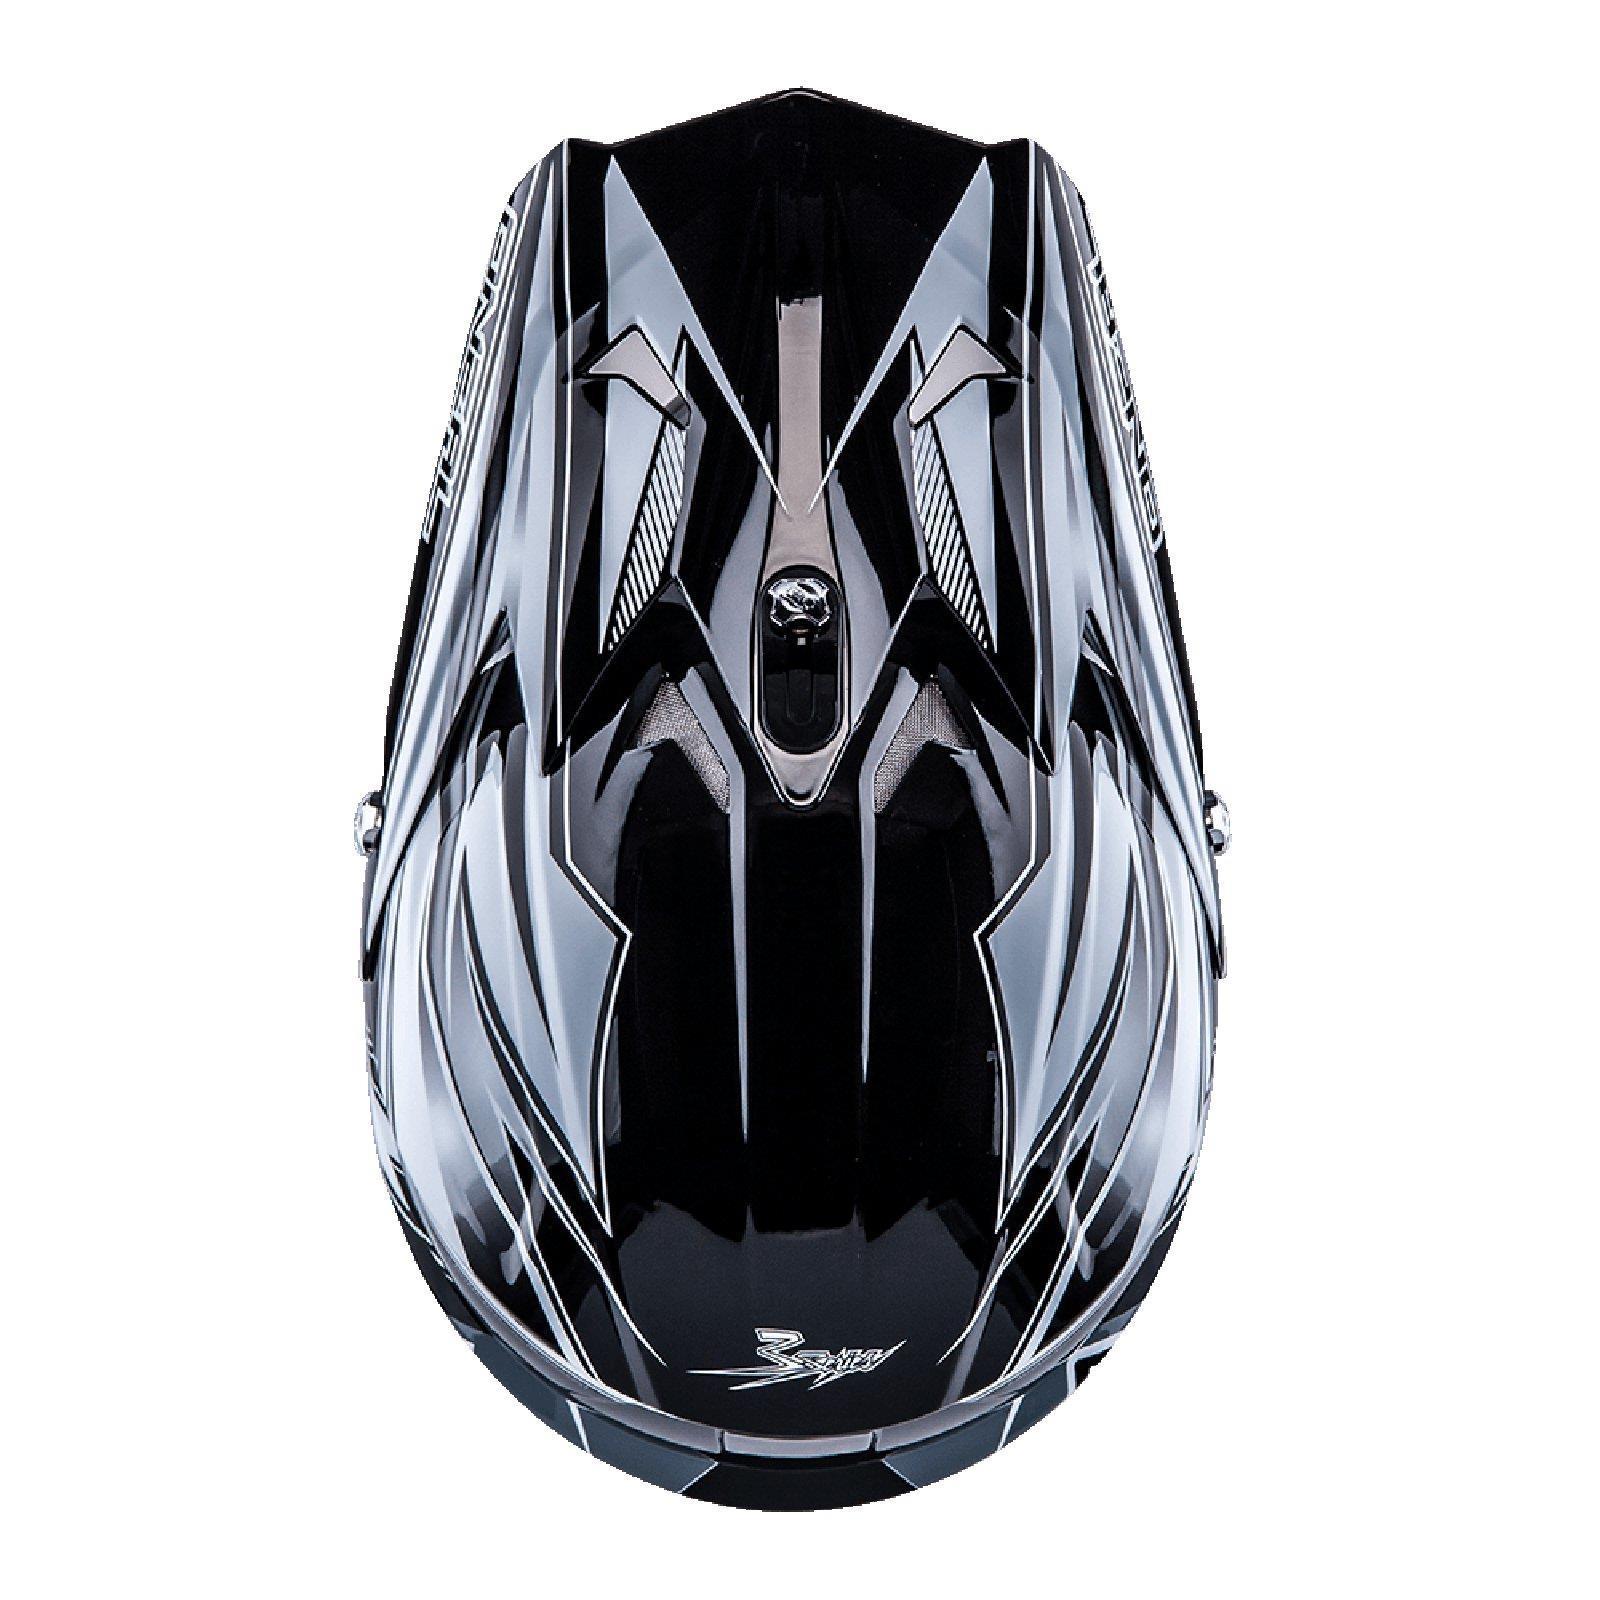 ONeal-Motocross-casco-MX-ENDURO-MOTO-BICI-FUORISTRADA-CROSS-Series-Adventure miniatura 119